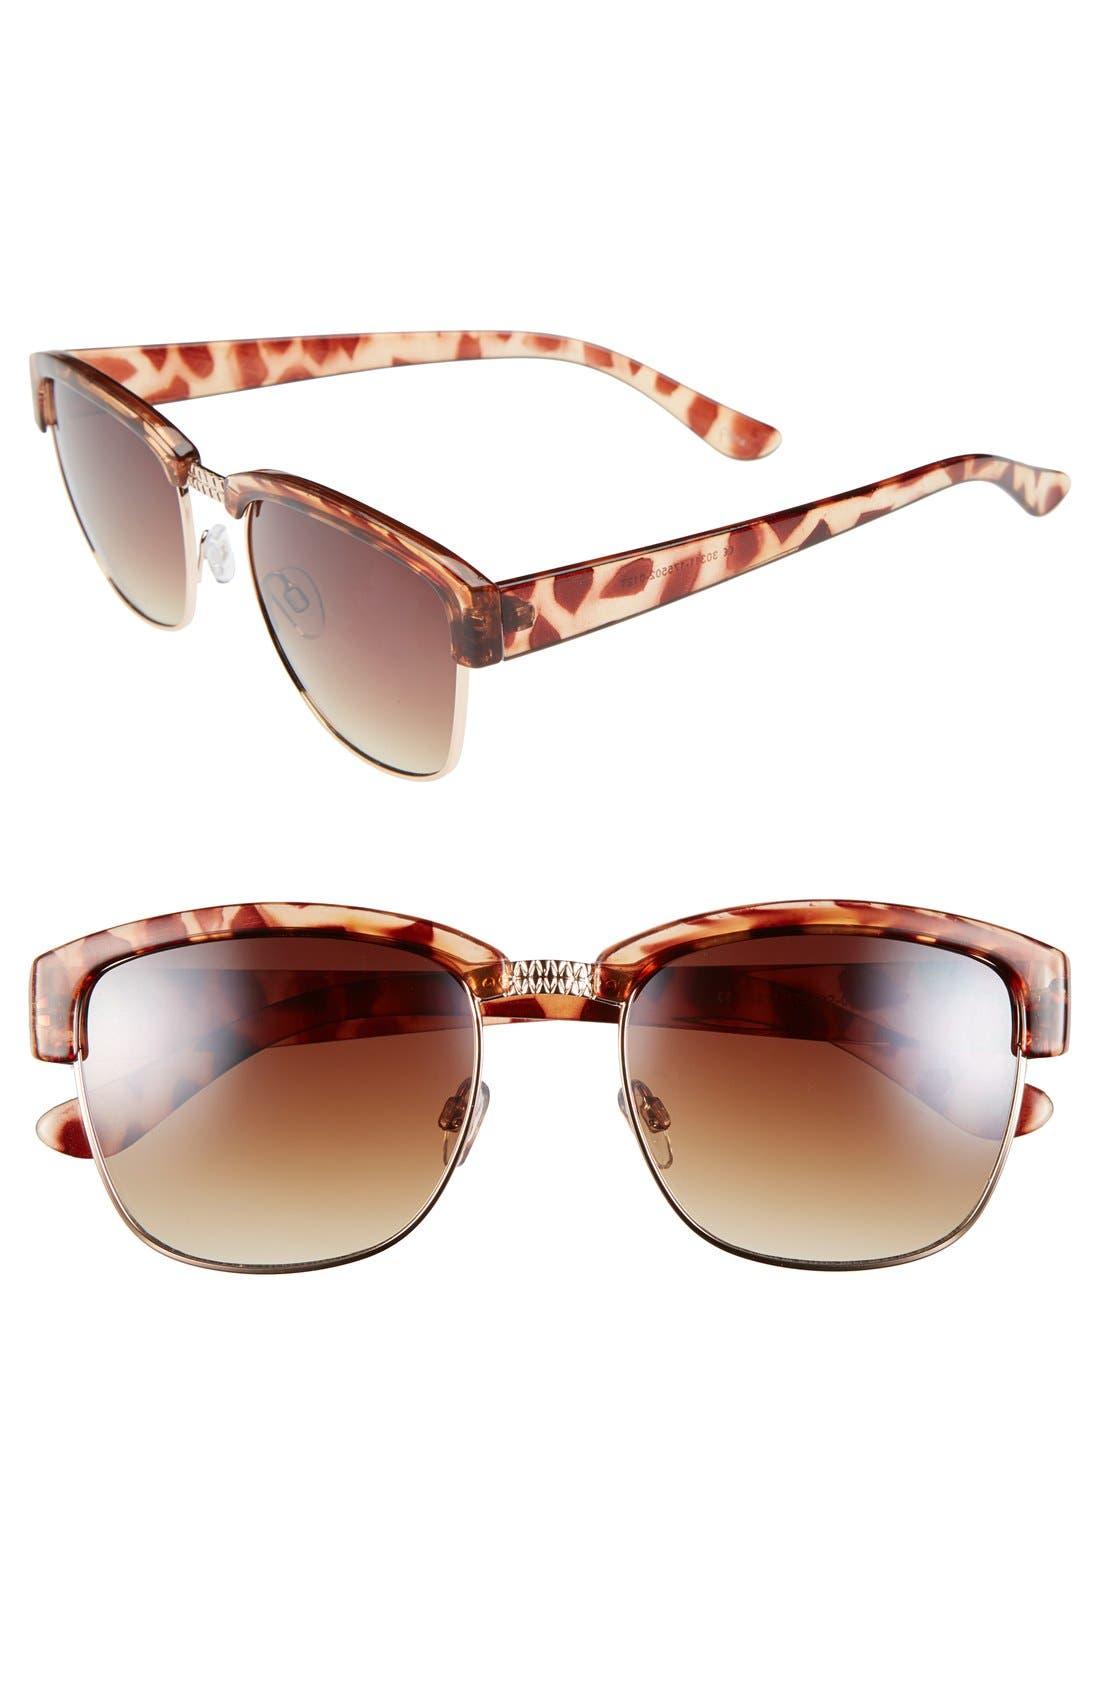 60mm Retro Sunglasses,                             Main thumbnail 1, color,                             200